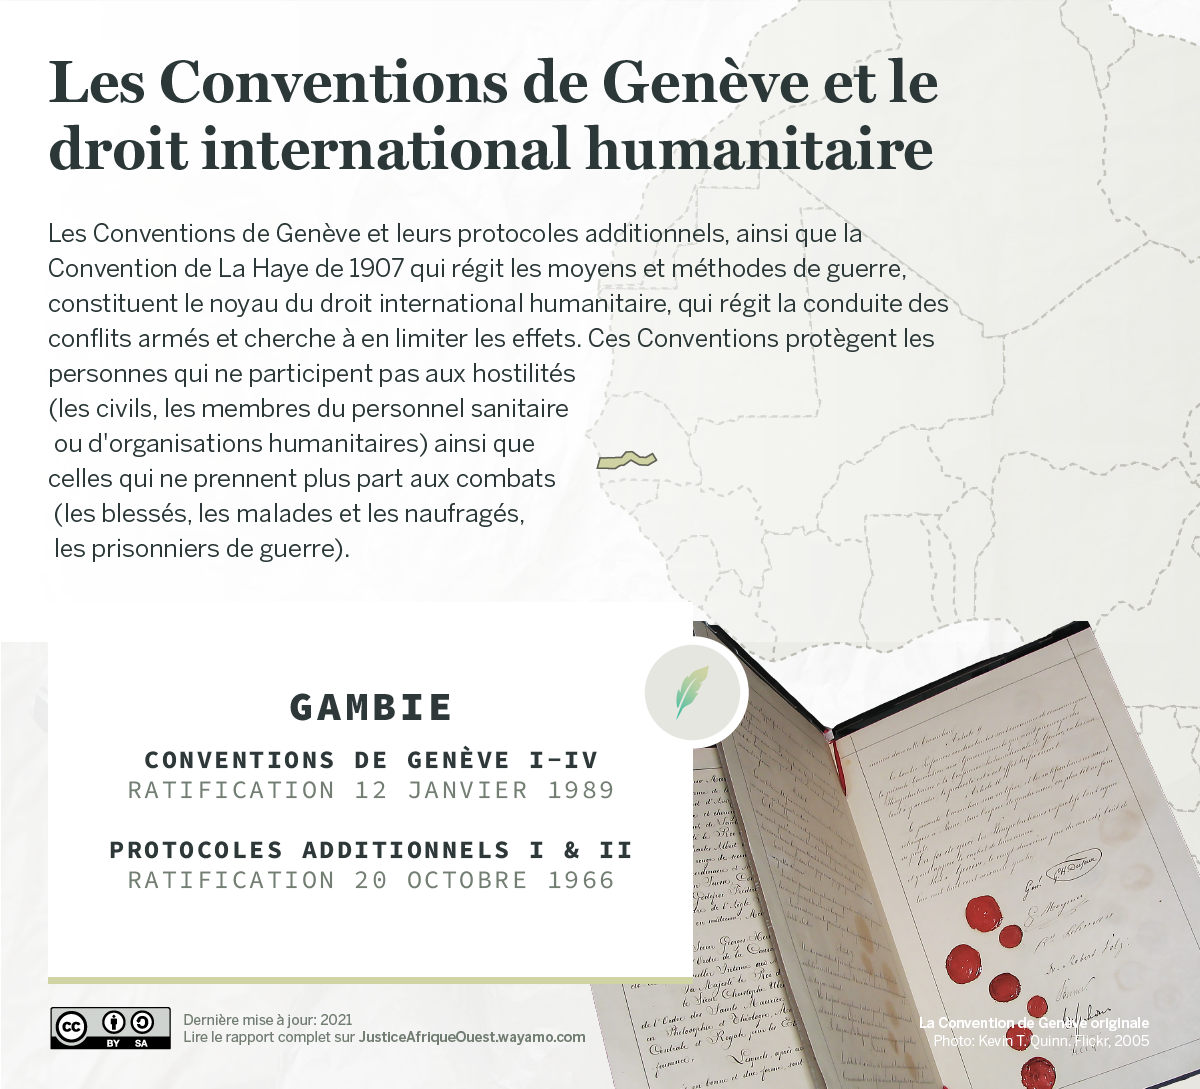 GAMBIE_Conventions de Genève - Wayamo Foundation (CC BY-SA 4.0)